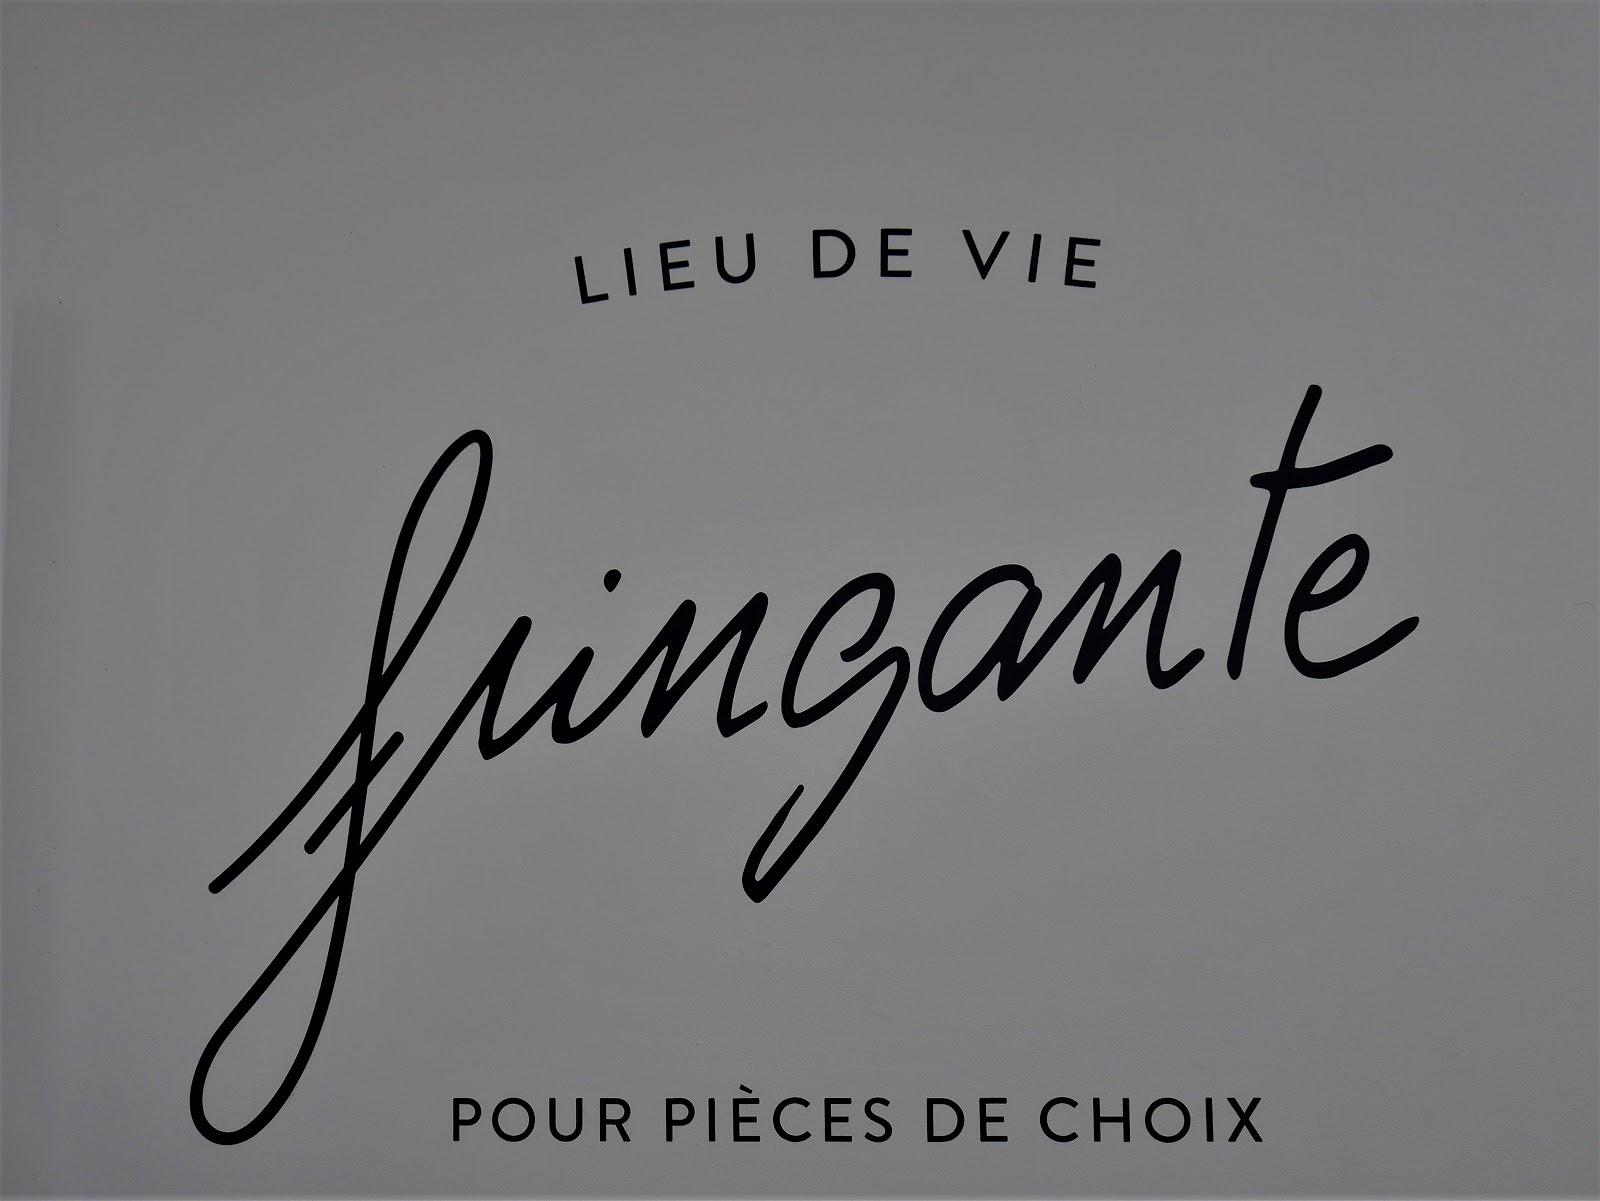 fringante-boutique-depot-vente-et-createurs-nogent-sur-marne-danslaruedacote.fr-11